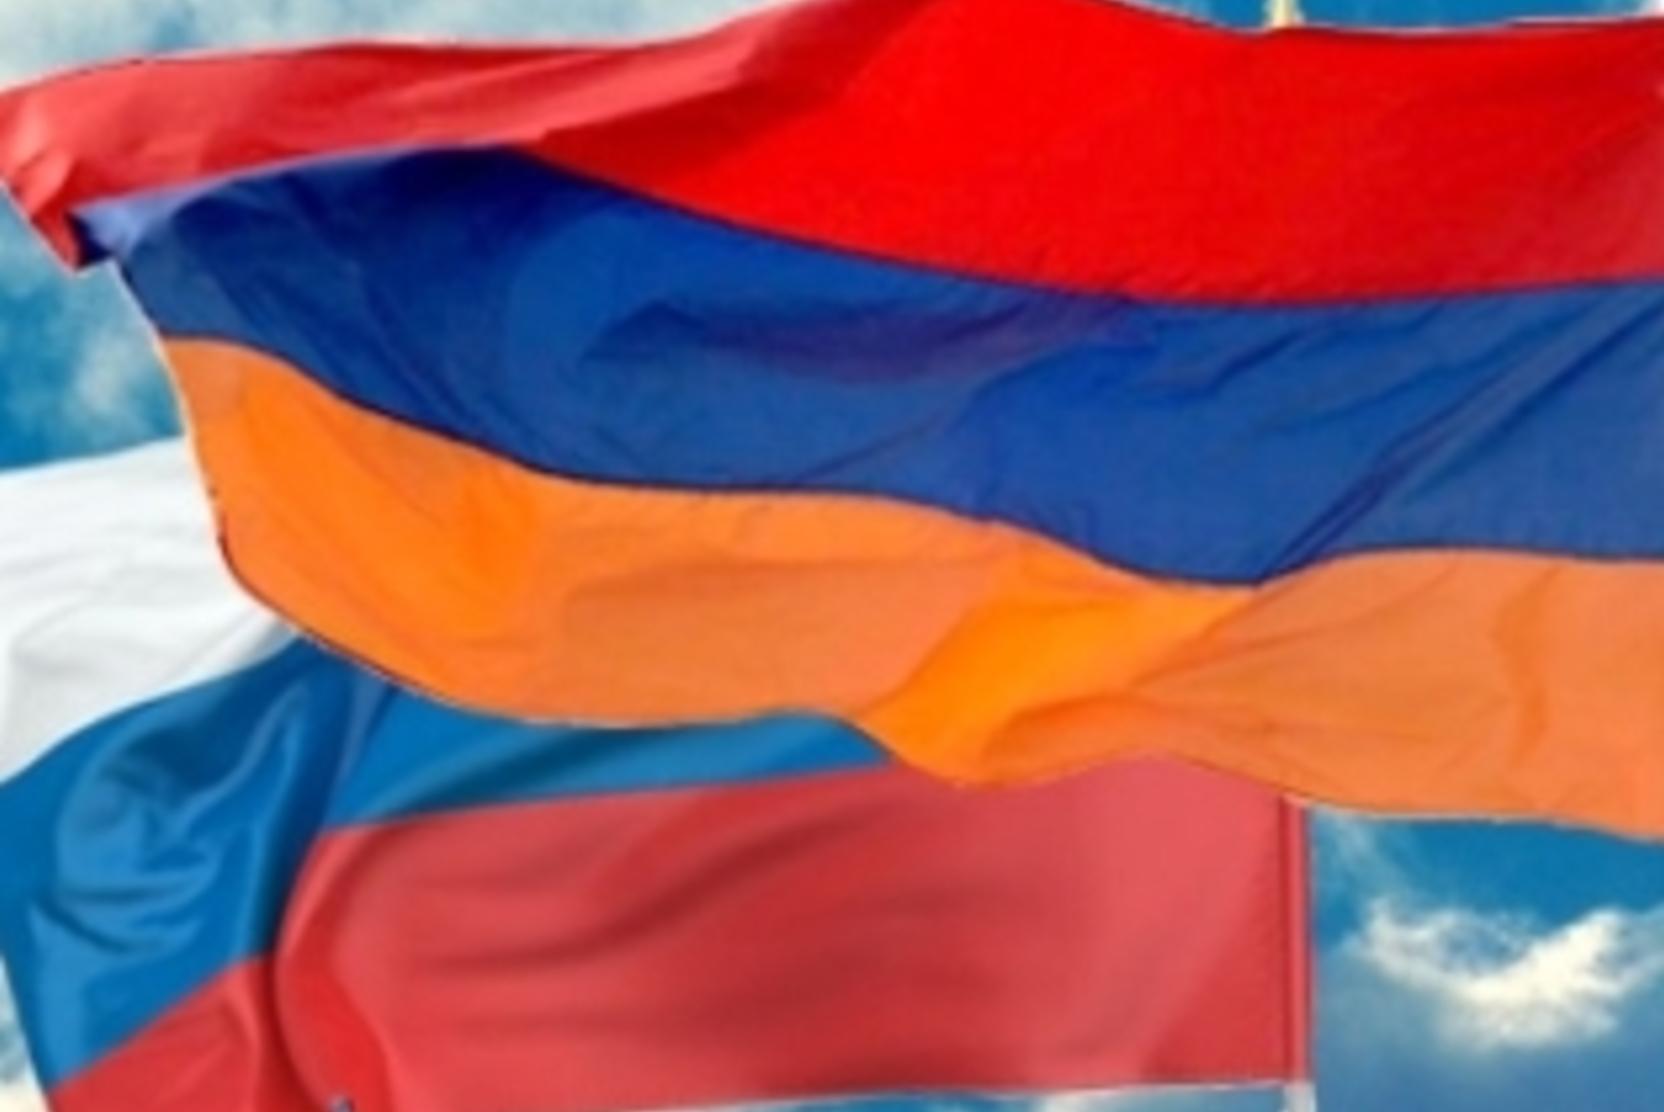 Стартовала вакцинация армянских медиков препаратом Cпутник V